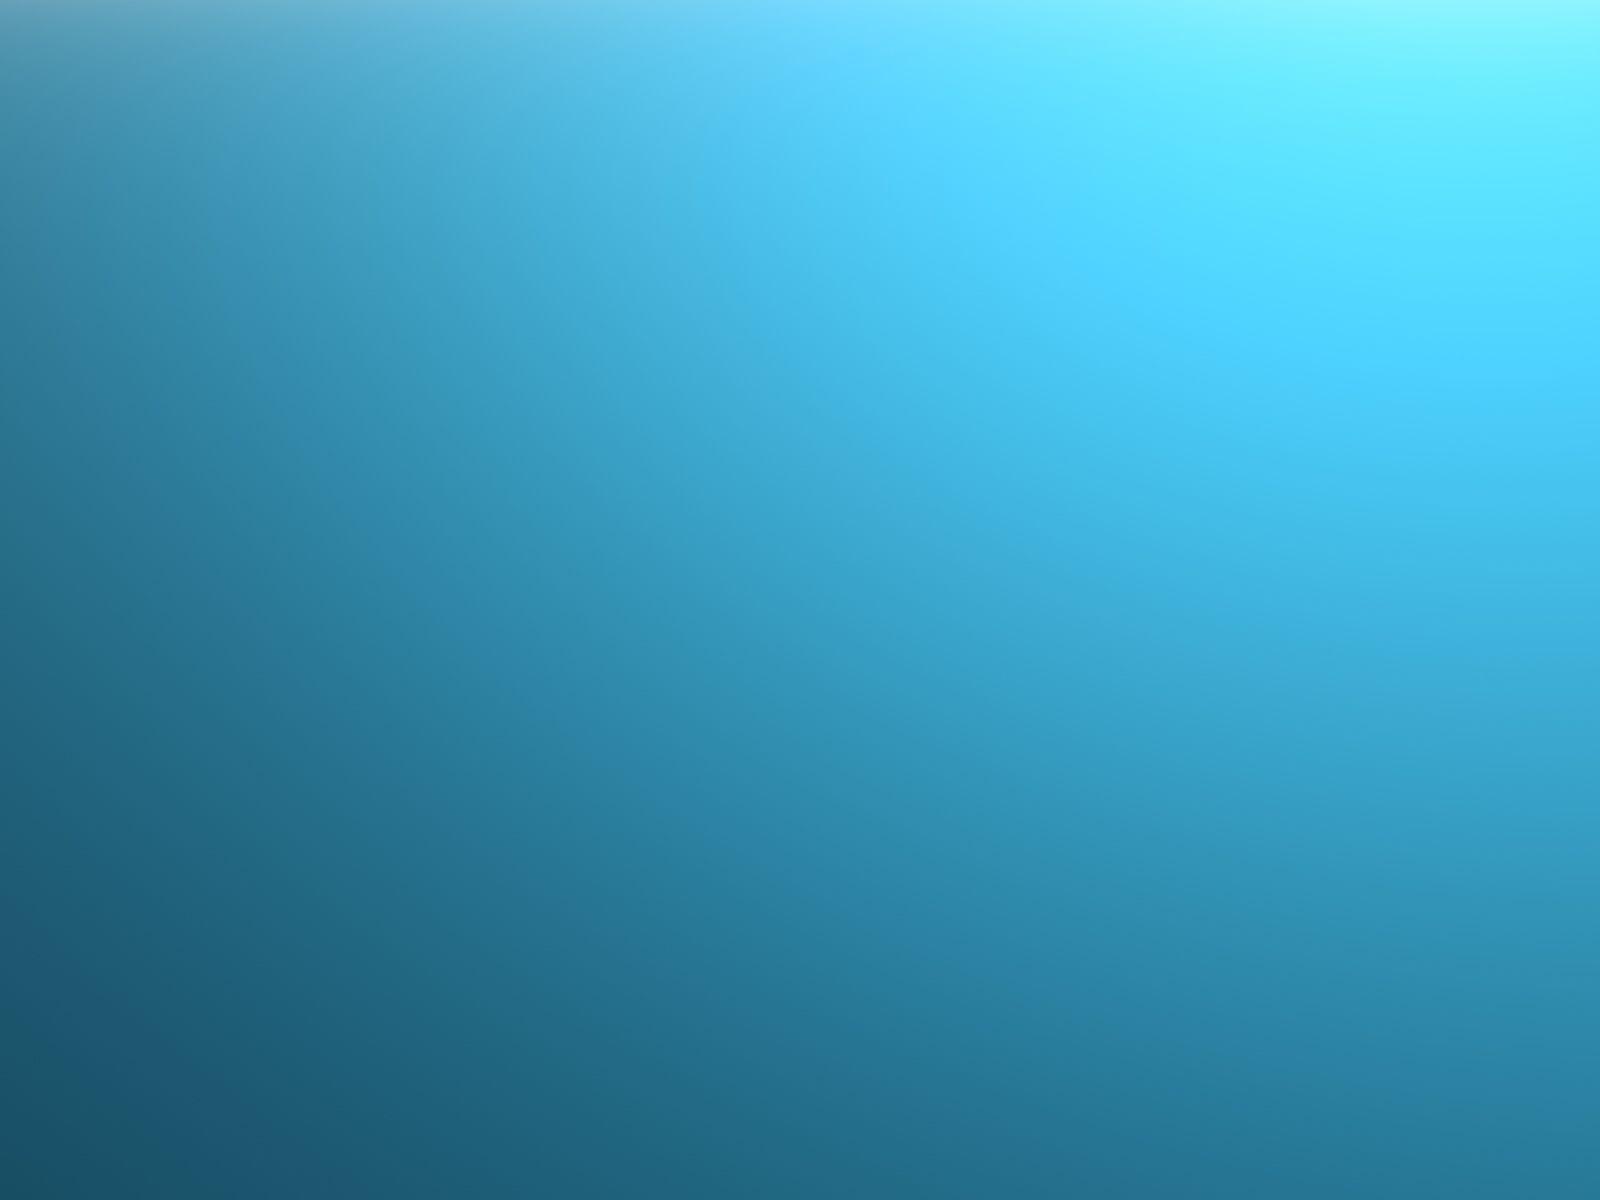 animated HD Blue Wallpaper